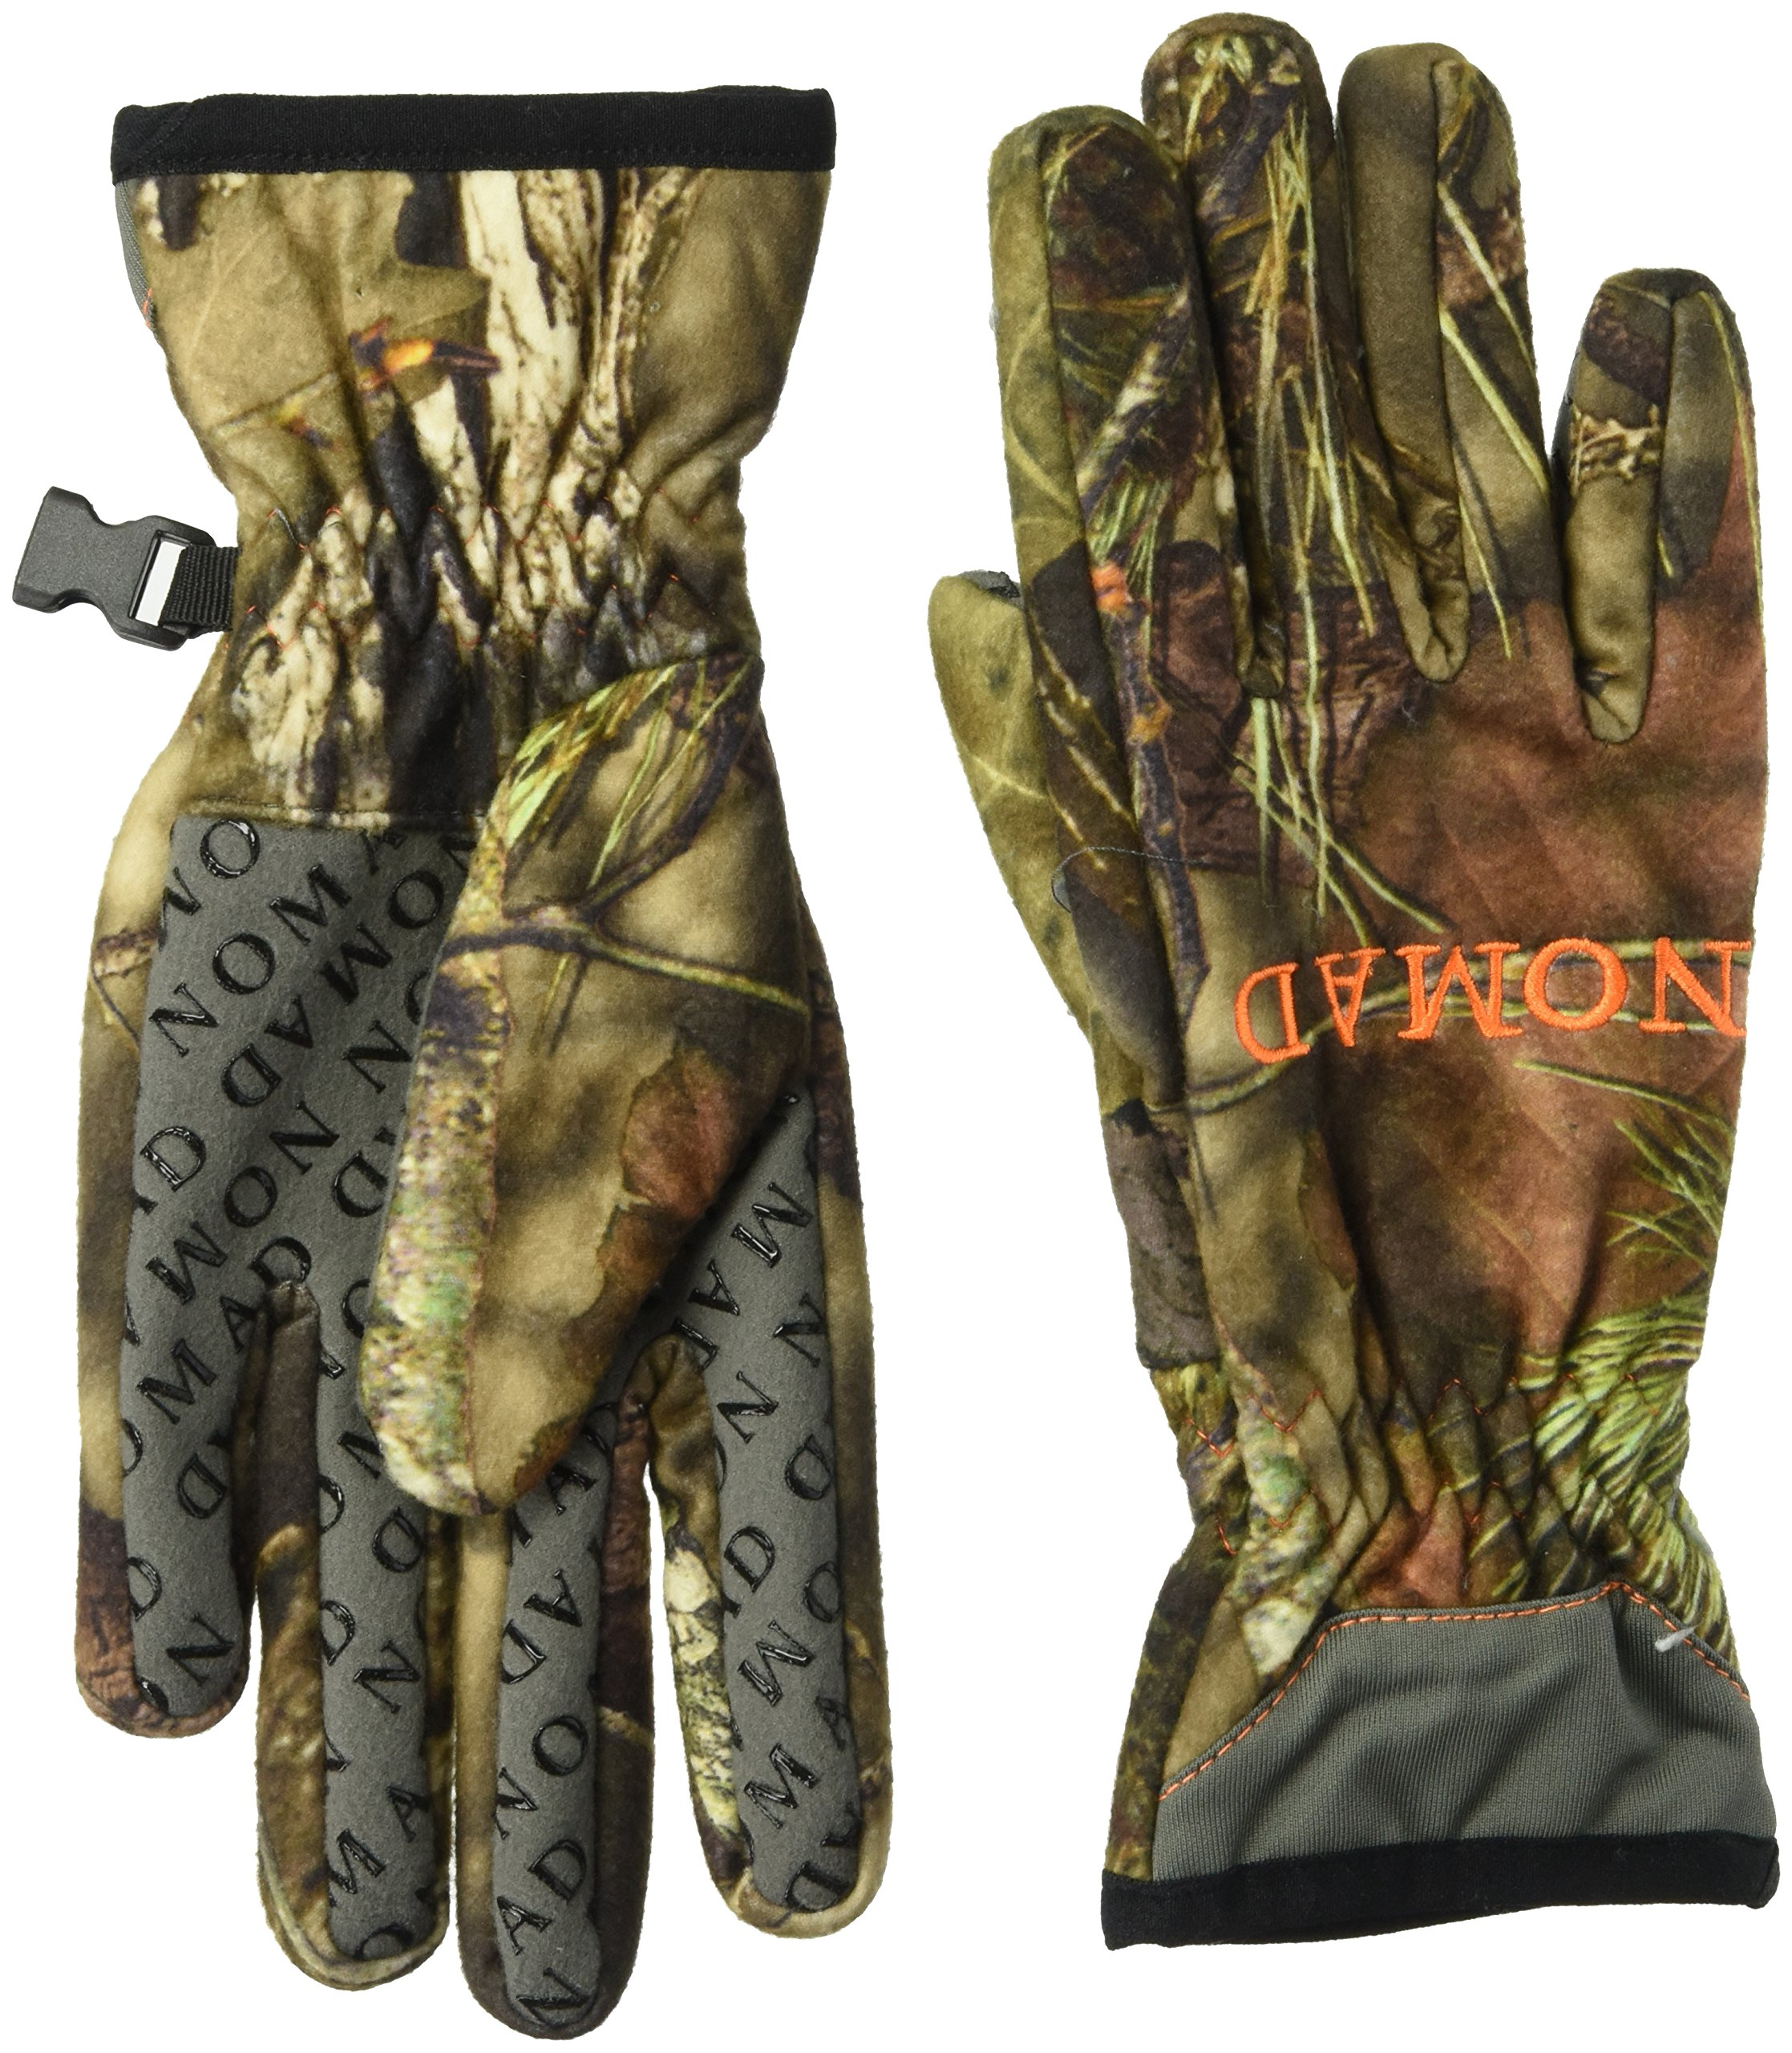 Nomad Men's Harvester Glove, Mossy Oak Break-Up Country, Medium by Nomad